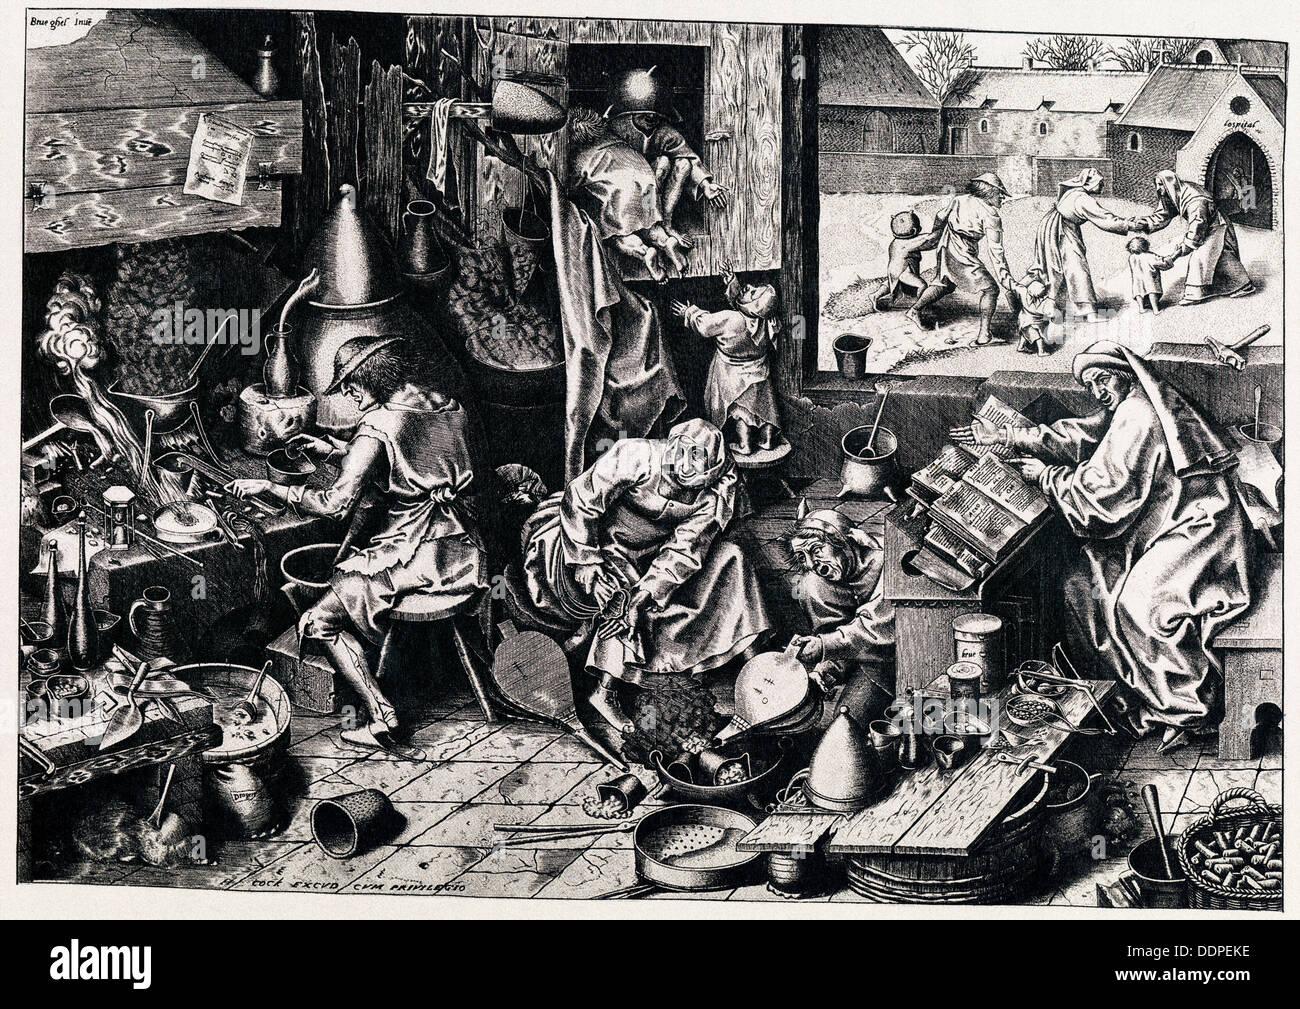 The Alchemist, 1558. Artist: Galle, Philipp (1537-1612) - Stock Image